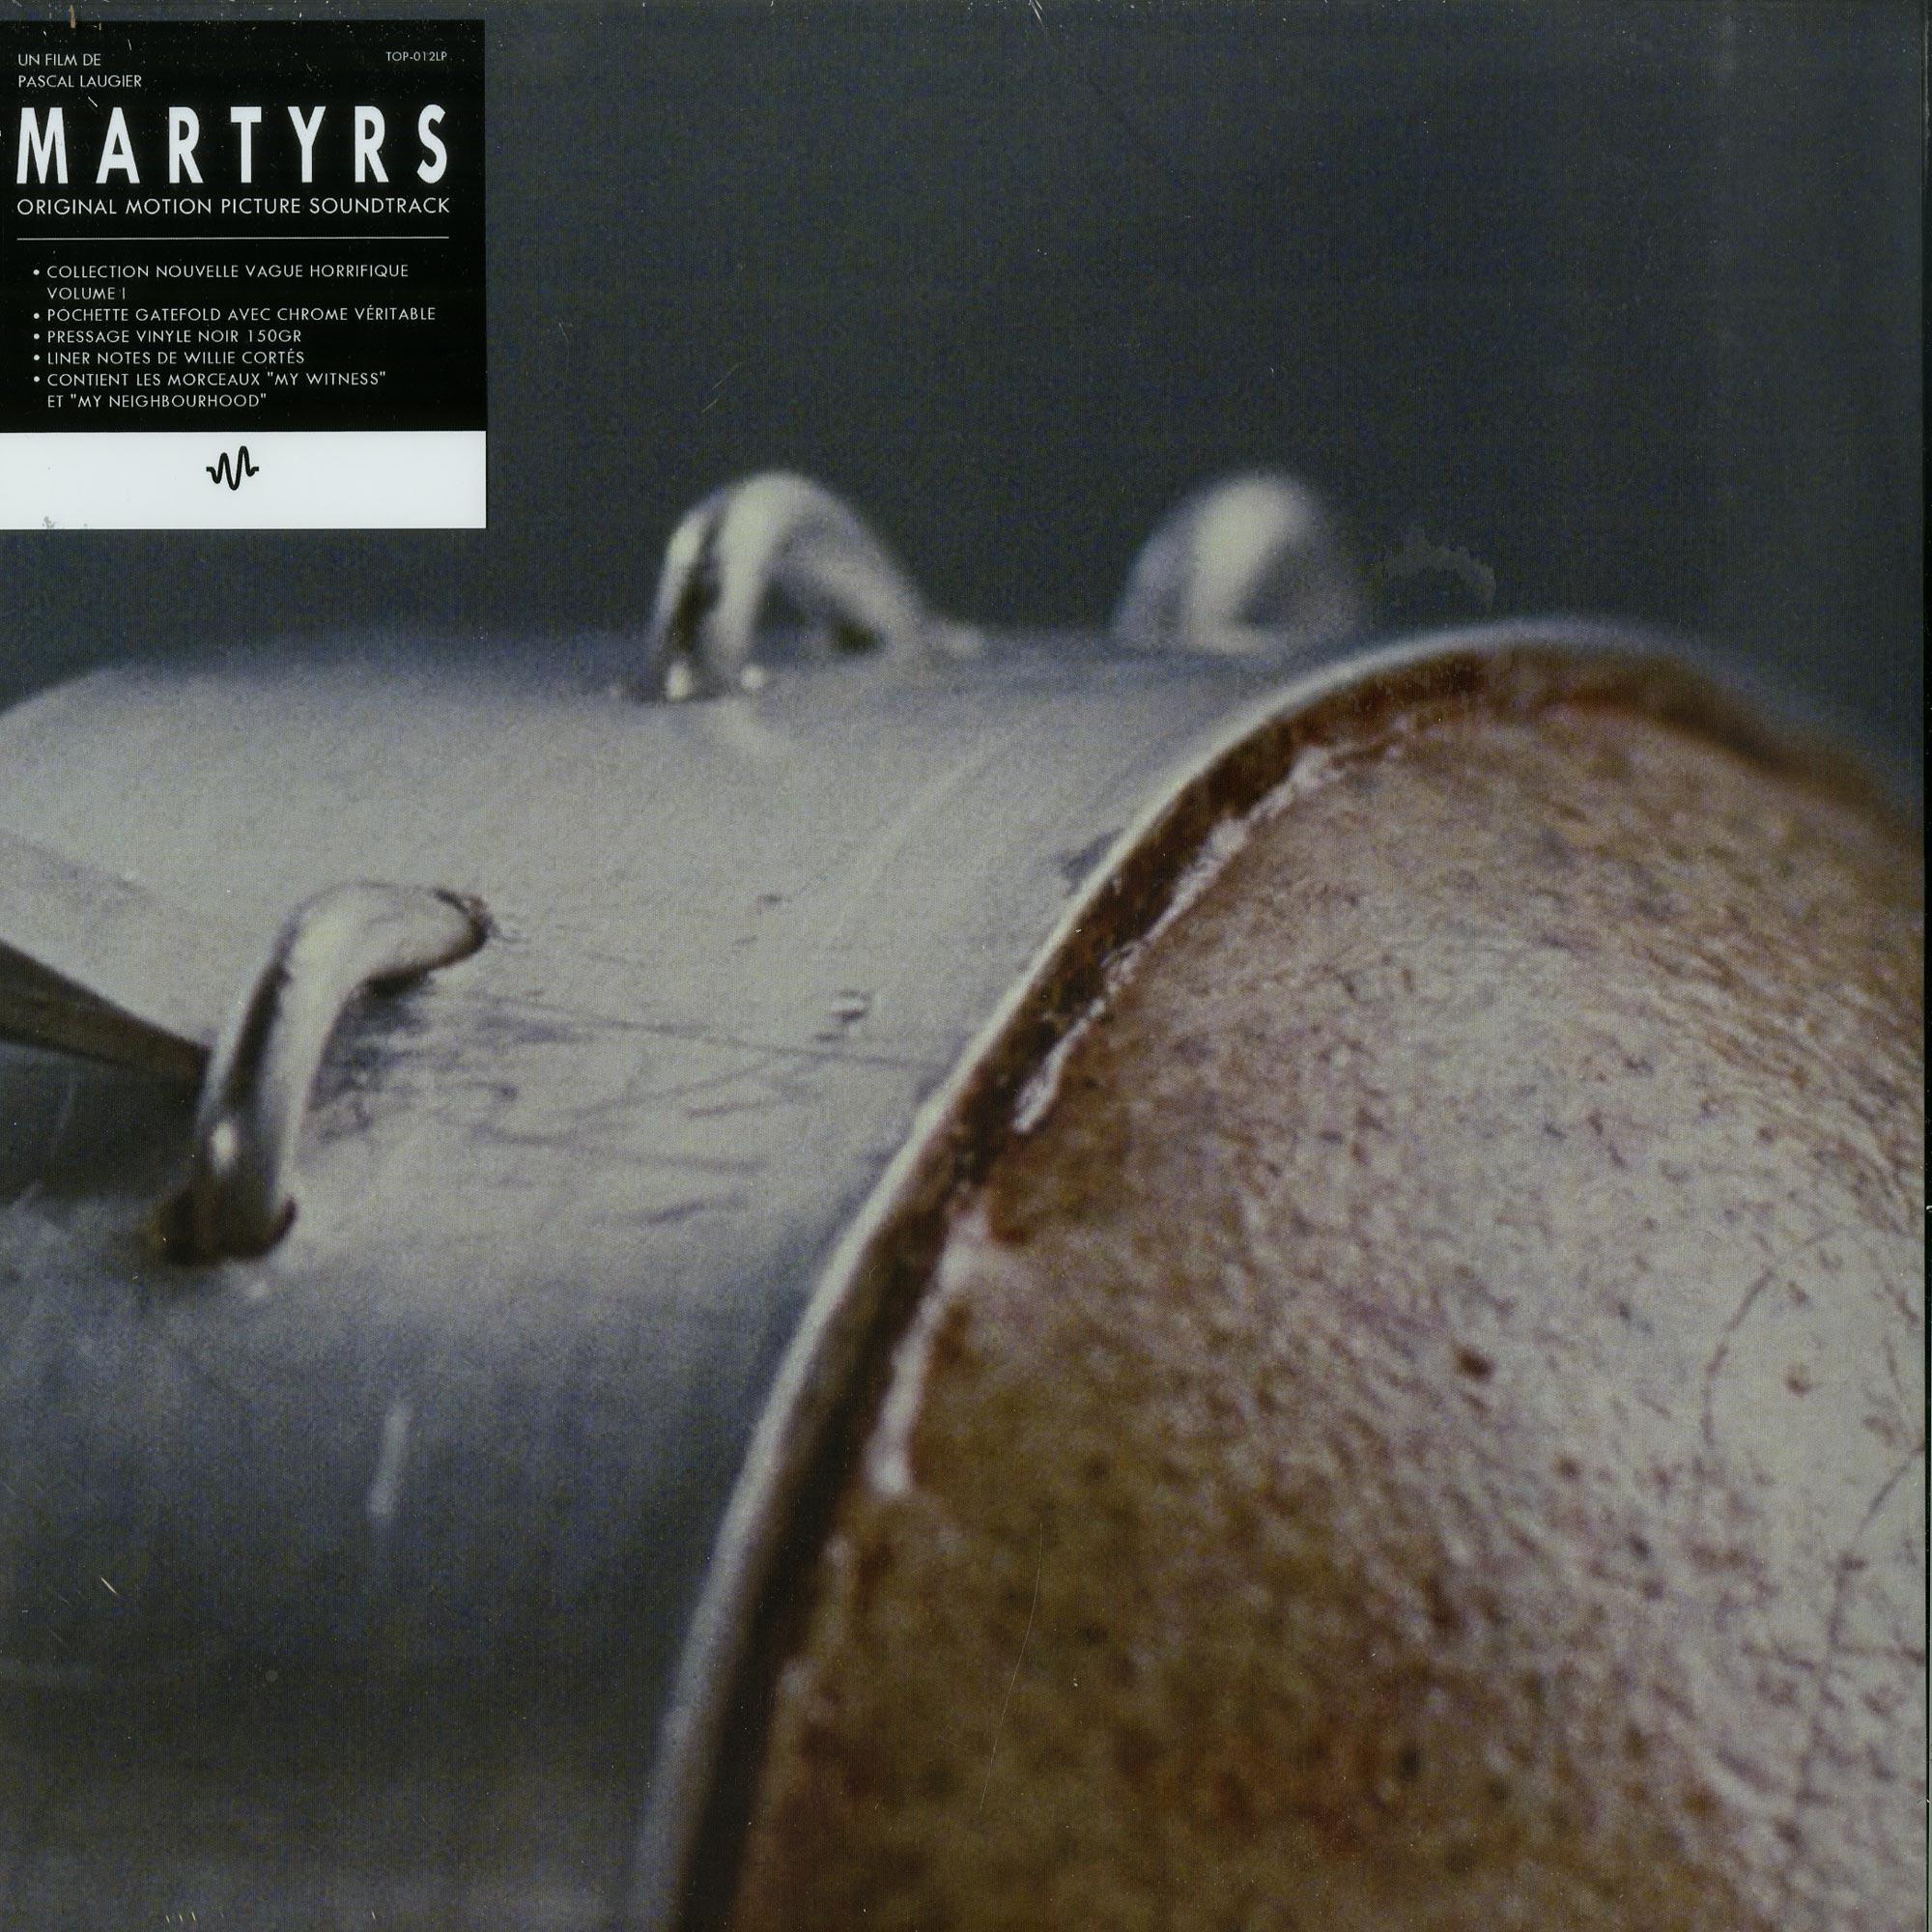 Seppuku Paradigm - MARTYRS